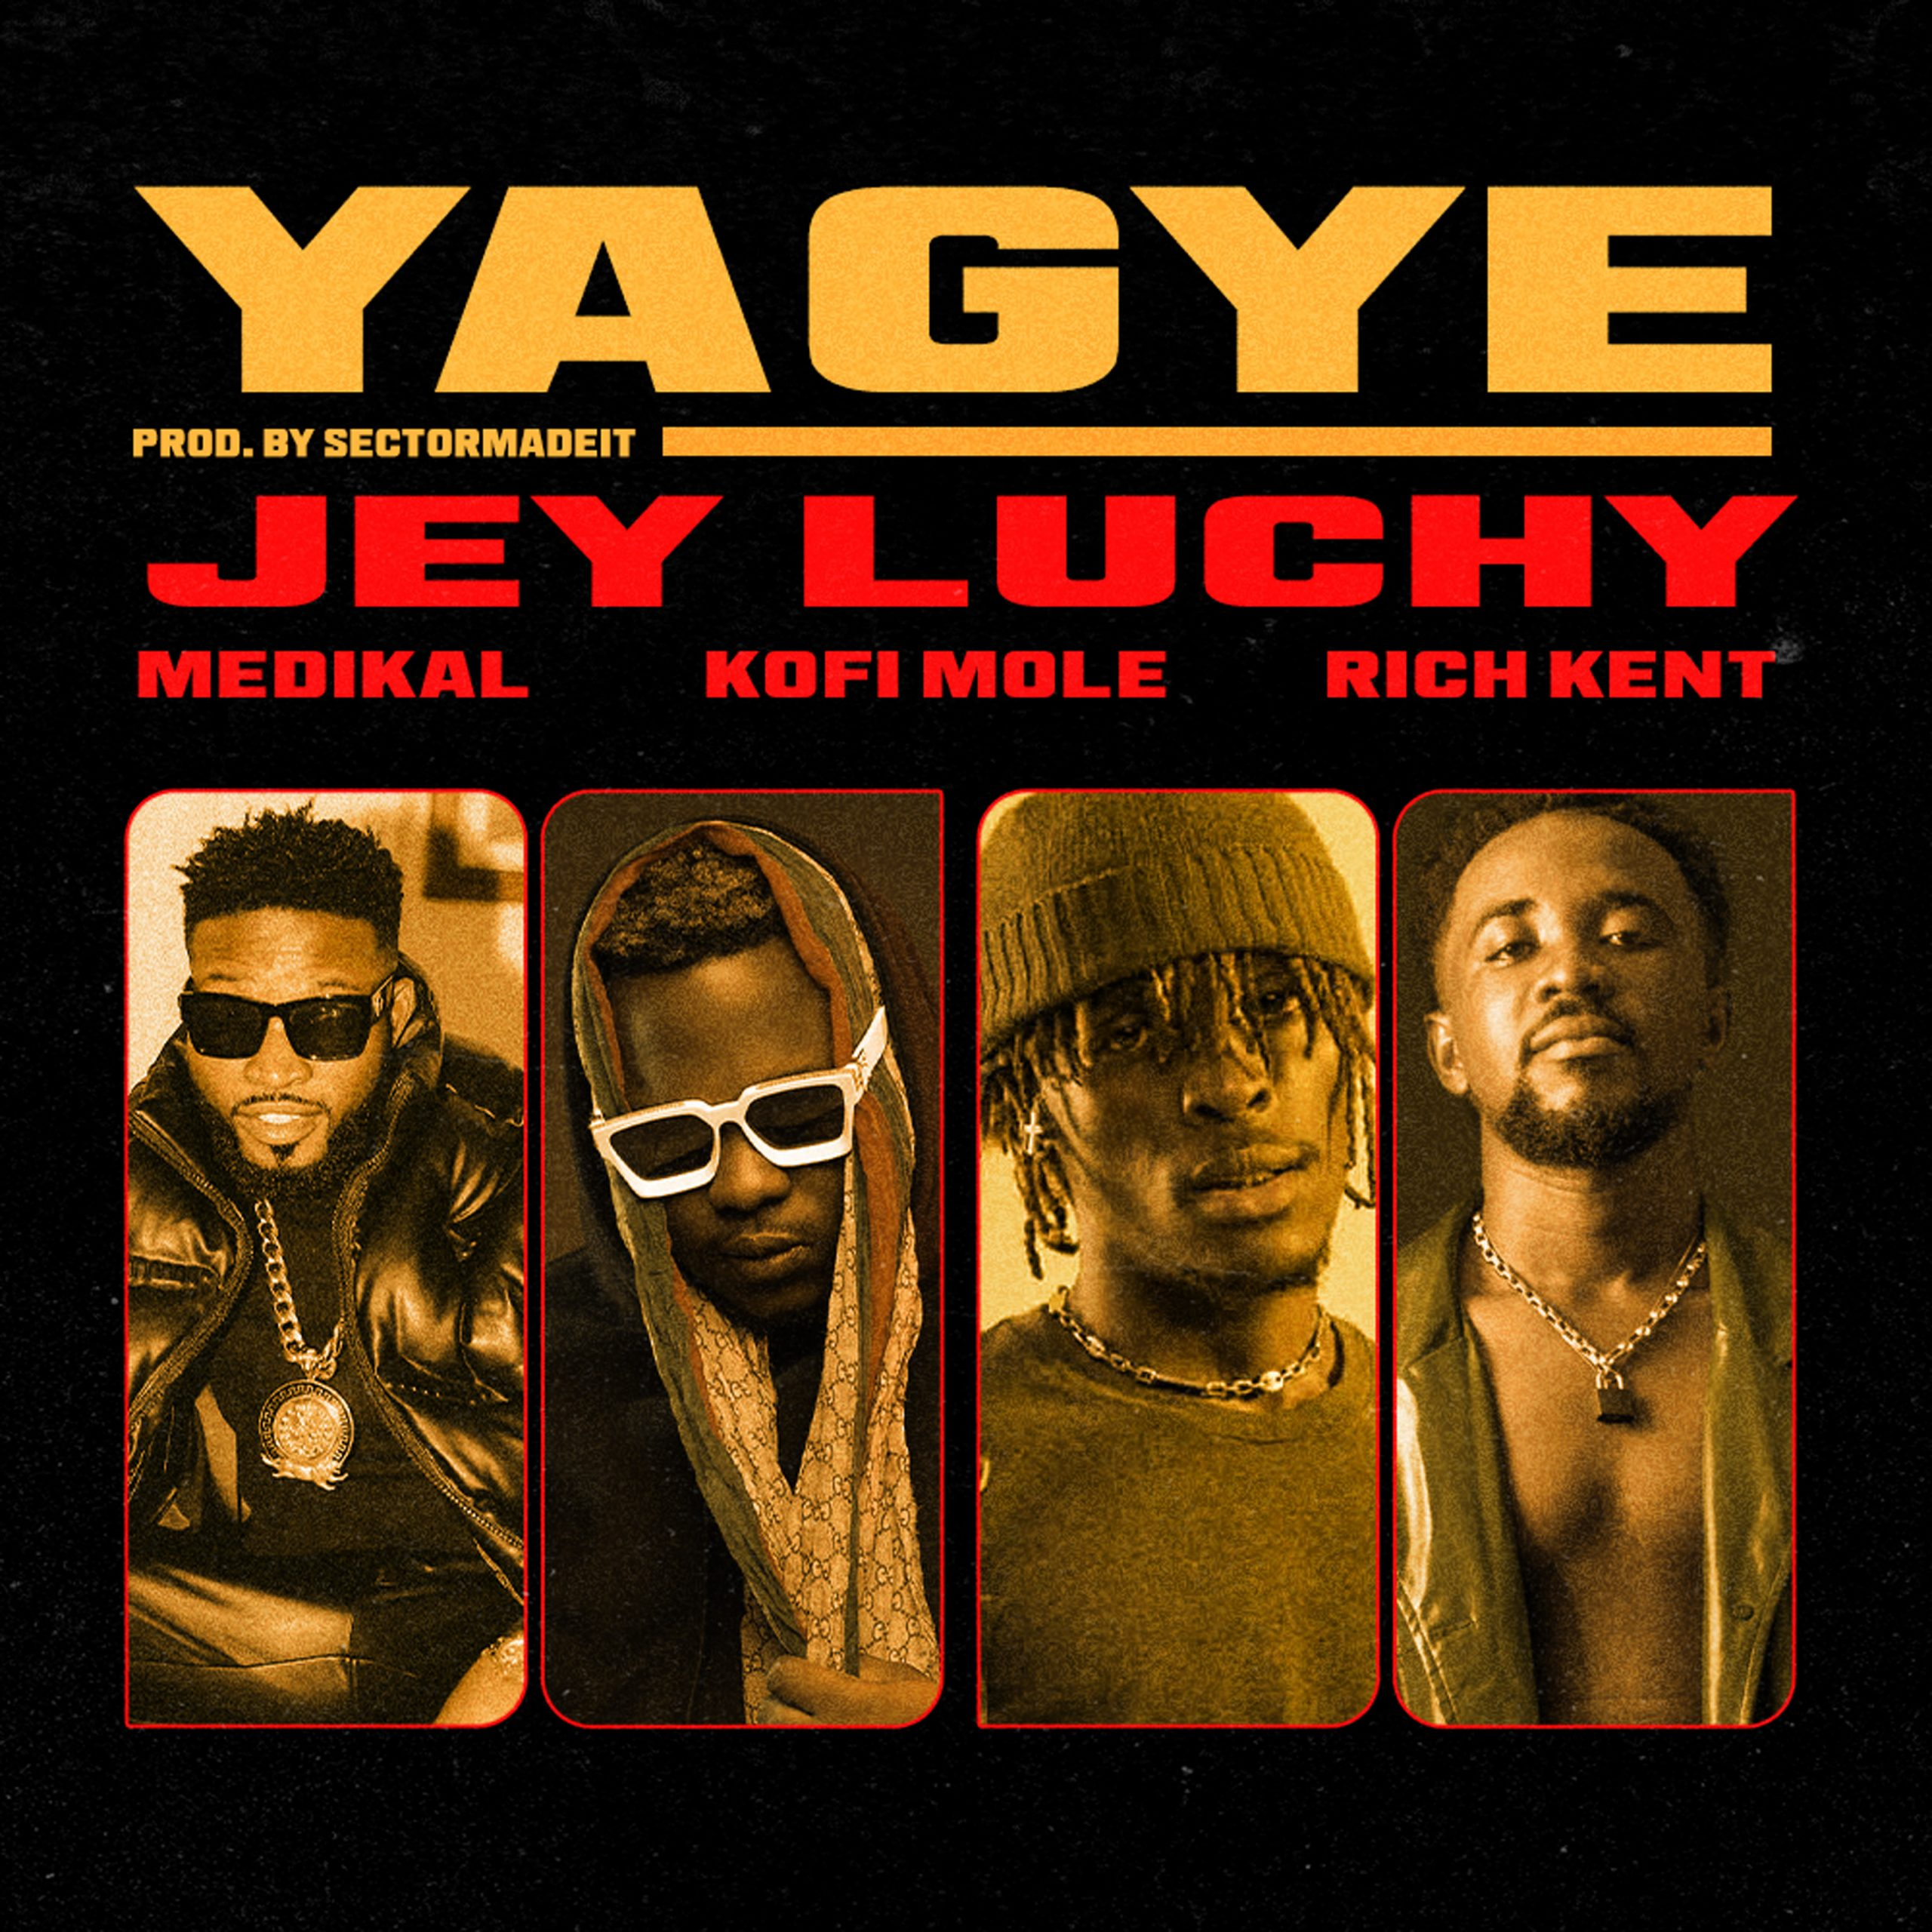 Yagye (feat. Medikal, Kofi Mole & Rich Kent) by Jey Luchy